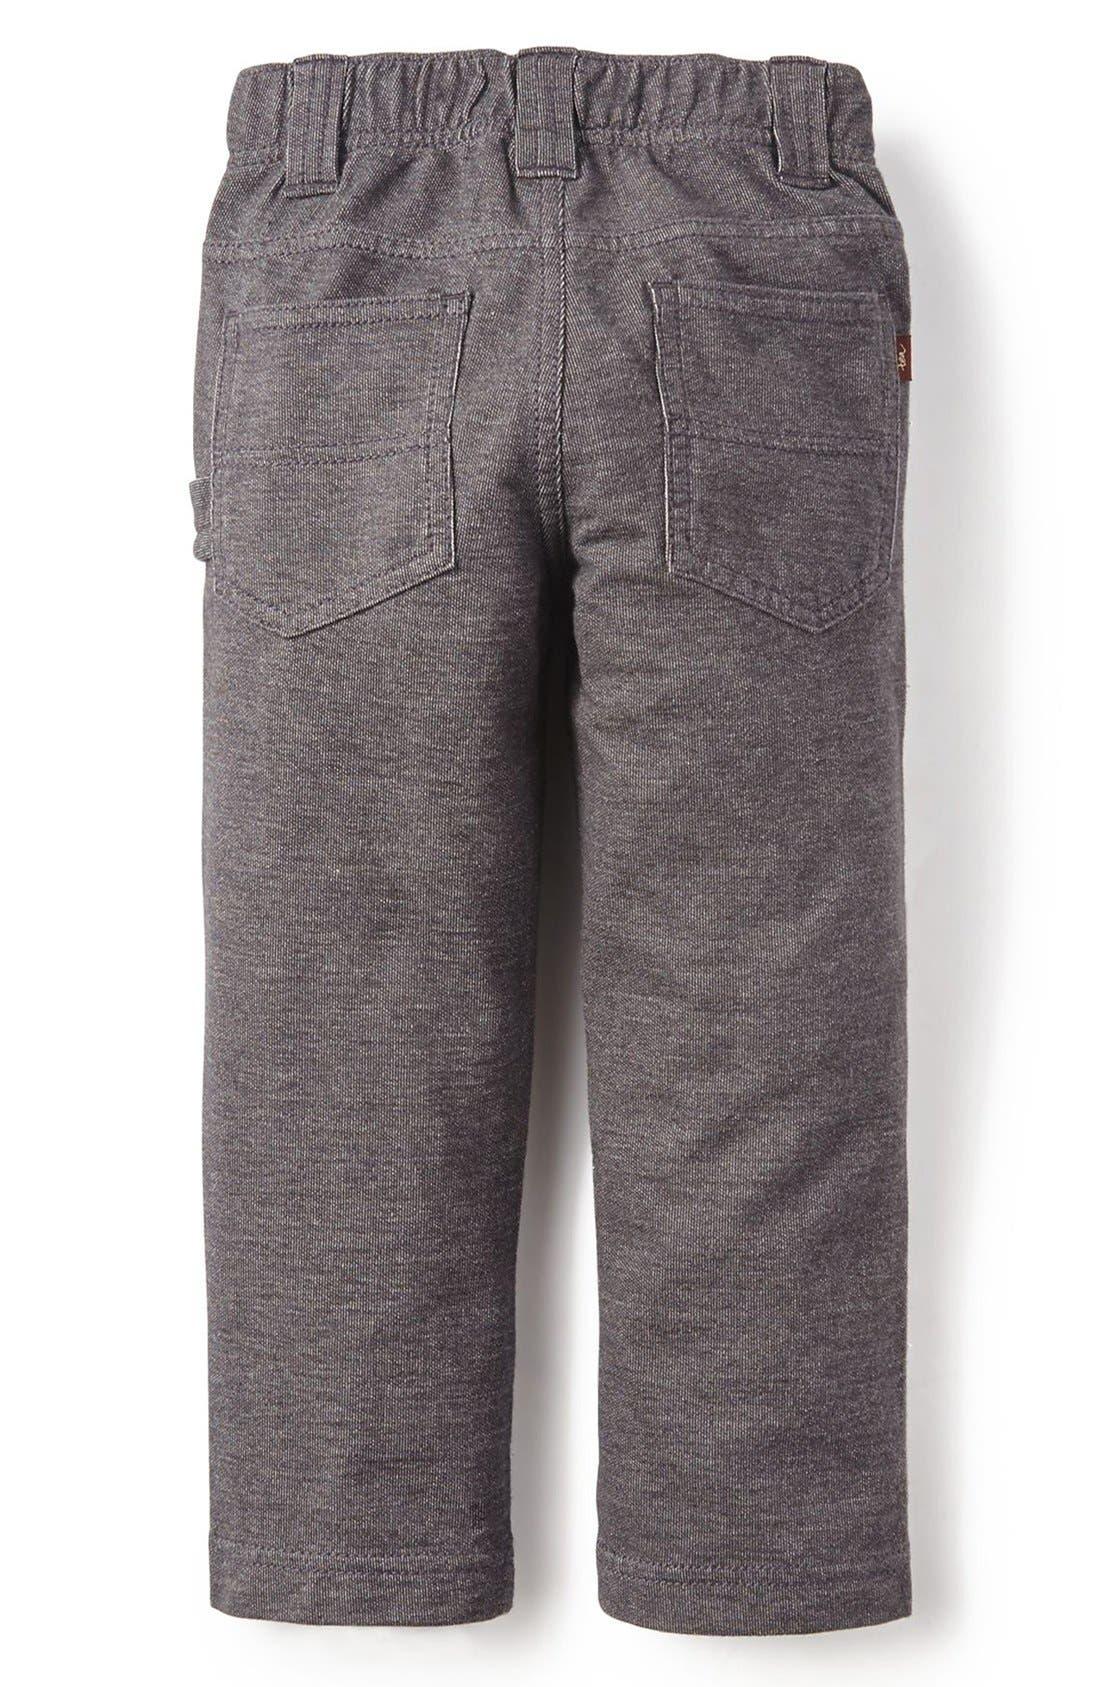 'Playwear' Pants,                             Alternate thumbnail 2, color,                             020